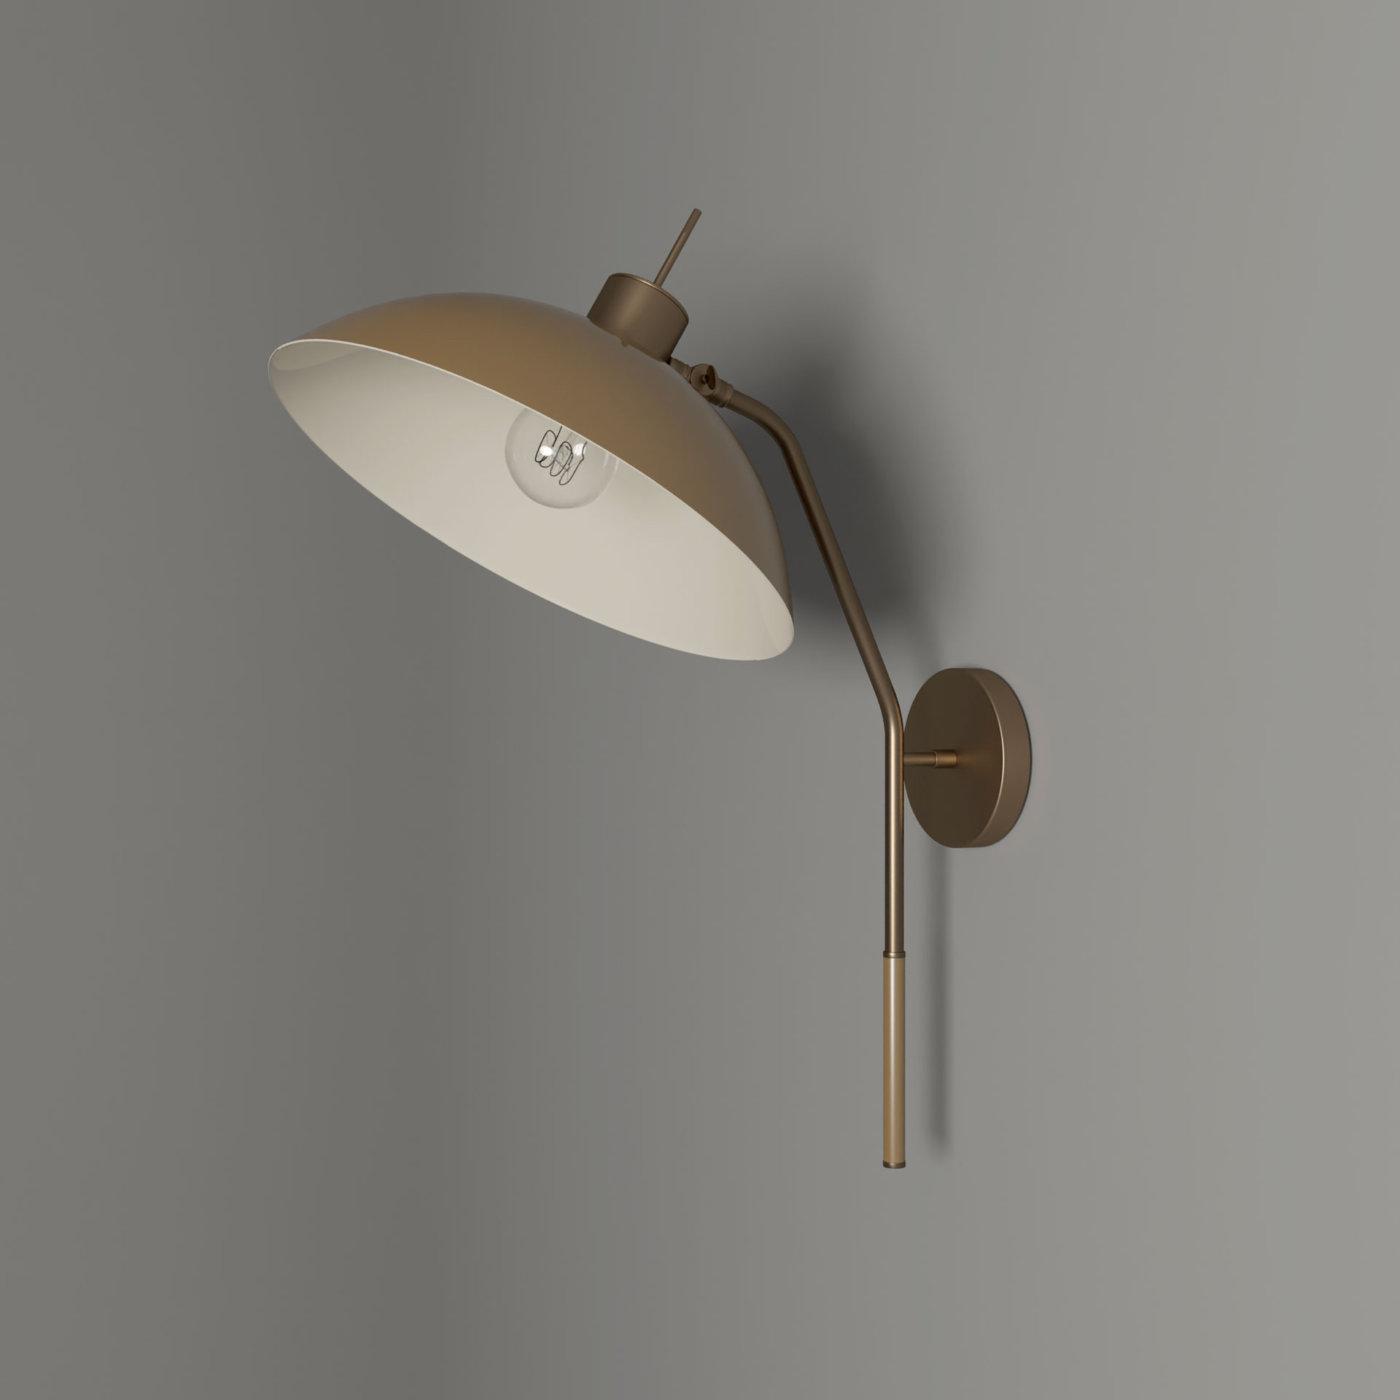 Noho wall lamp